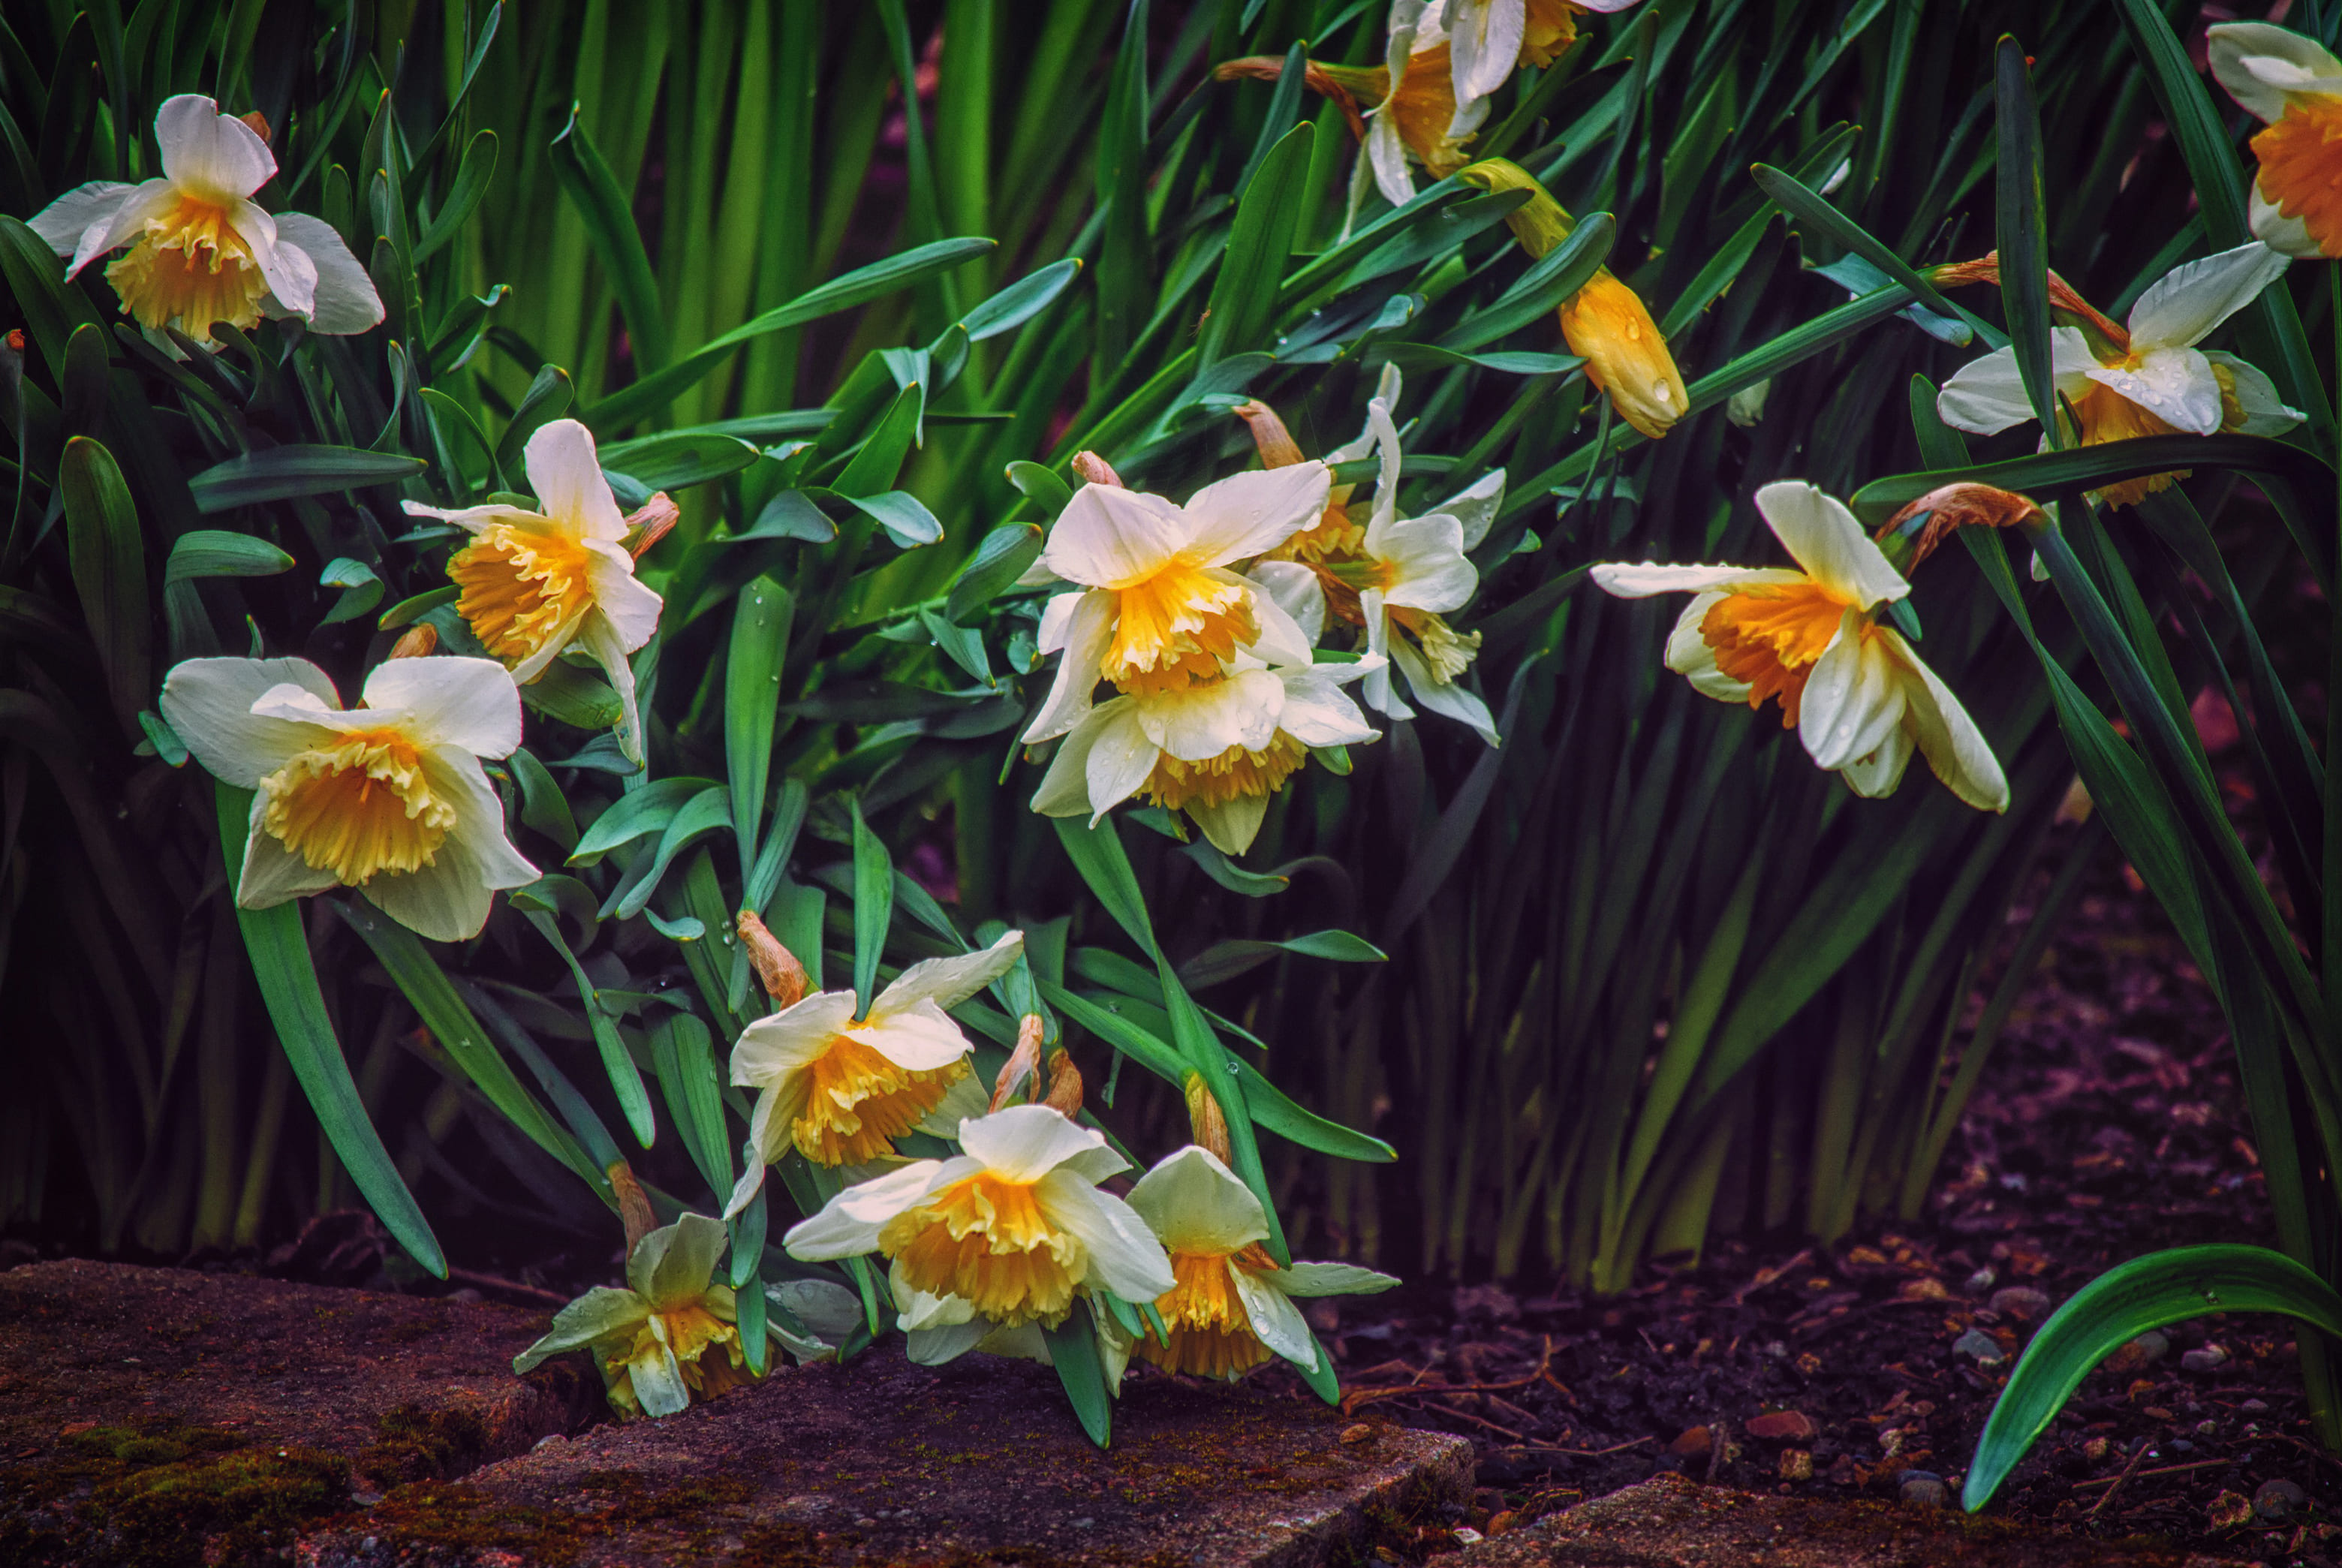 daffodils-photo-21